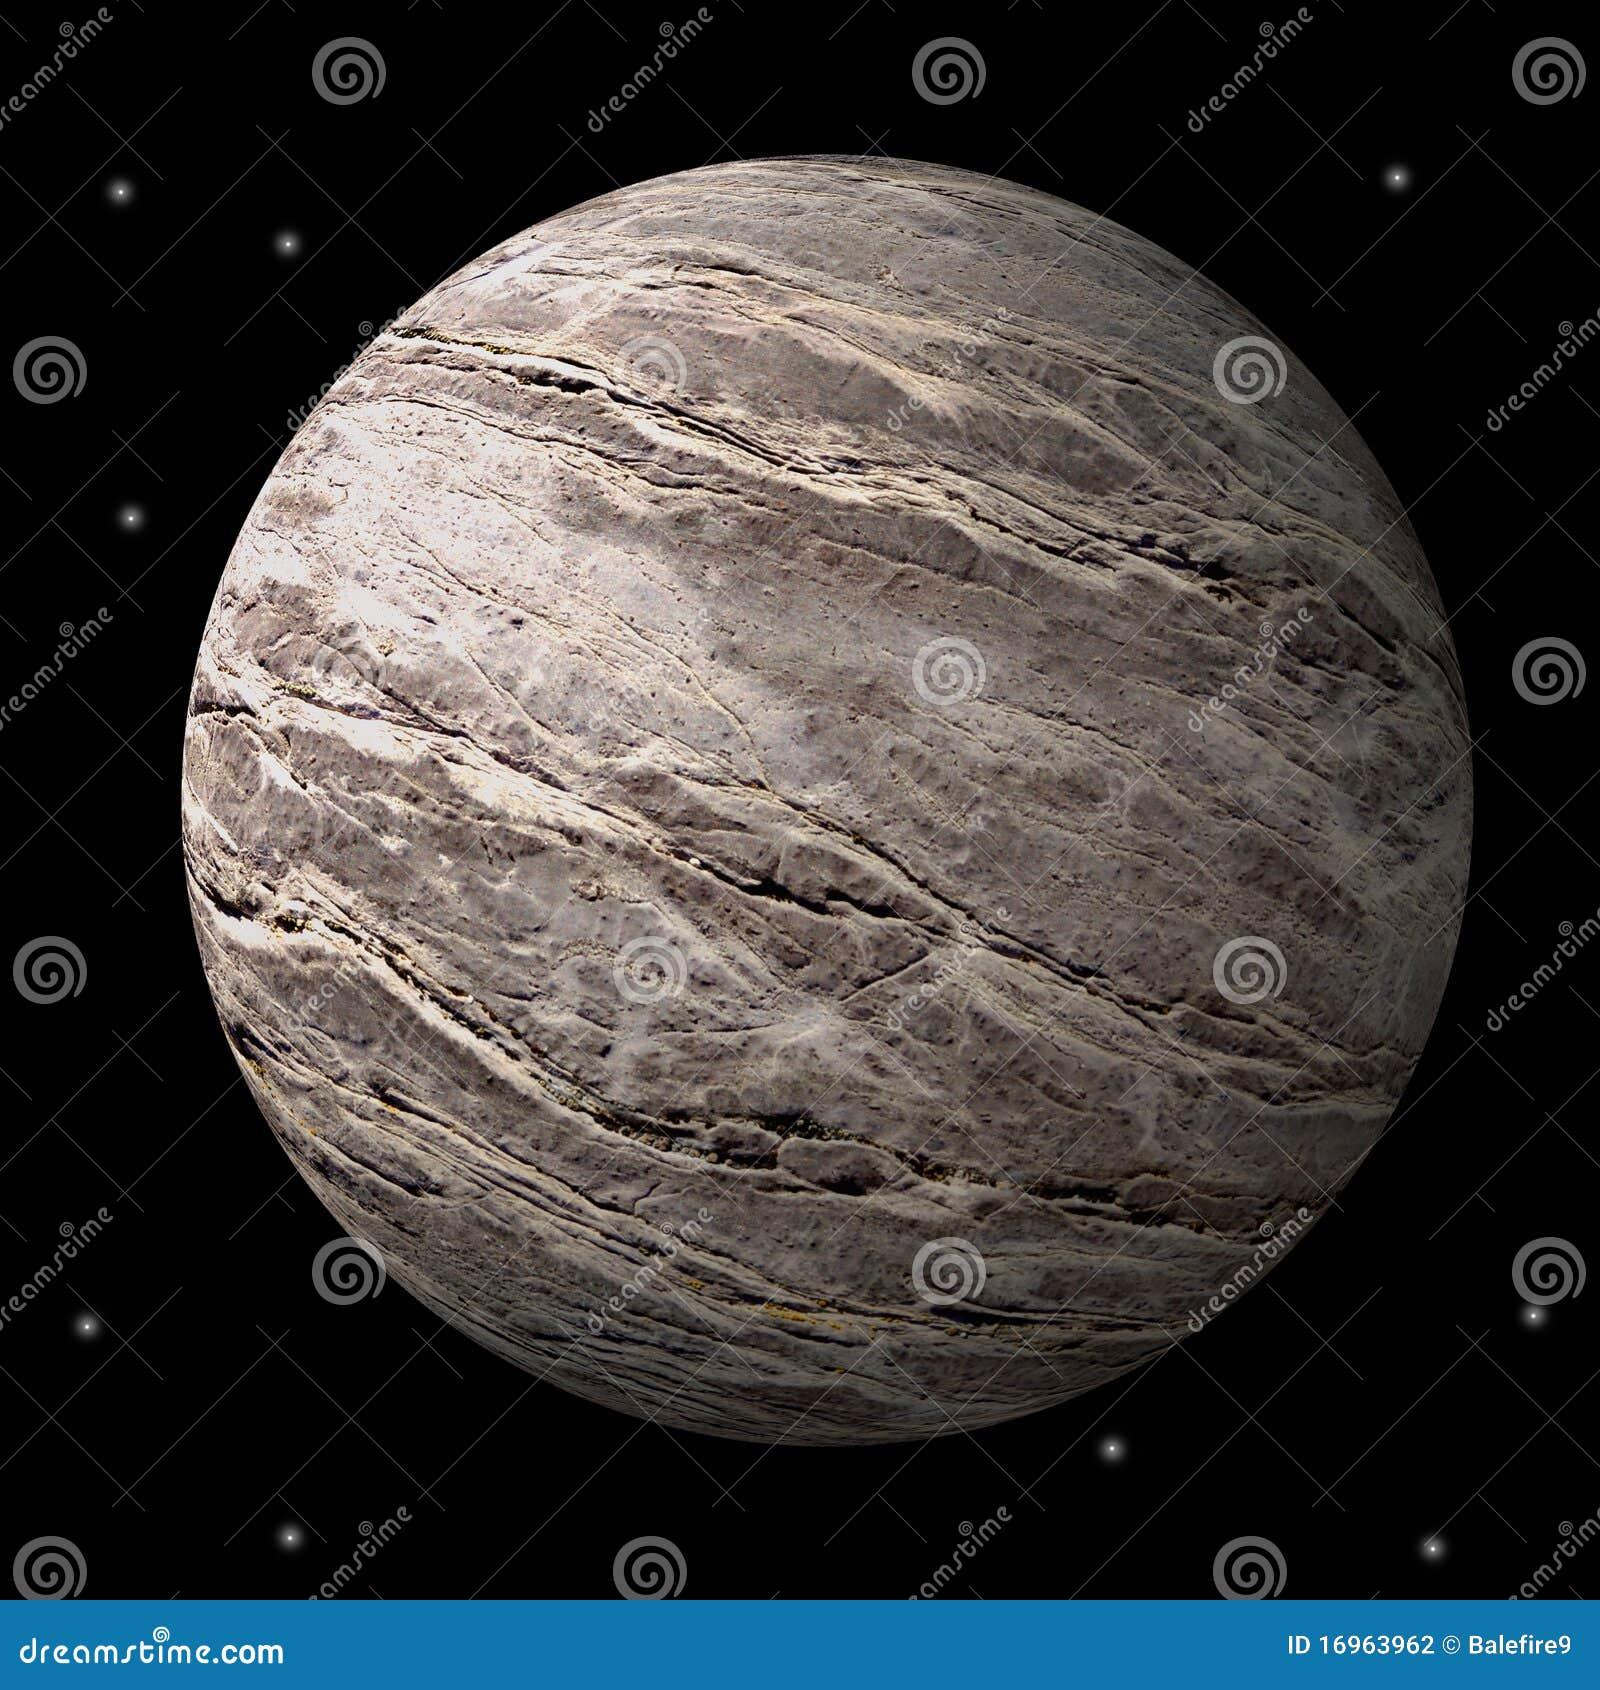 rock planets - photo #35